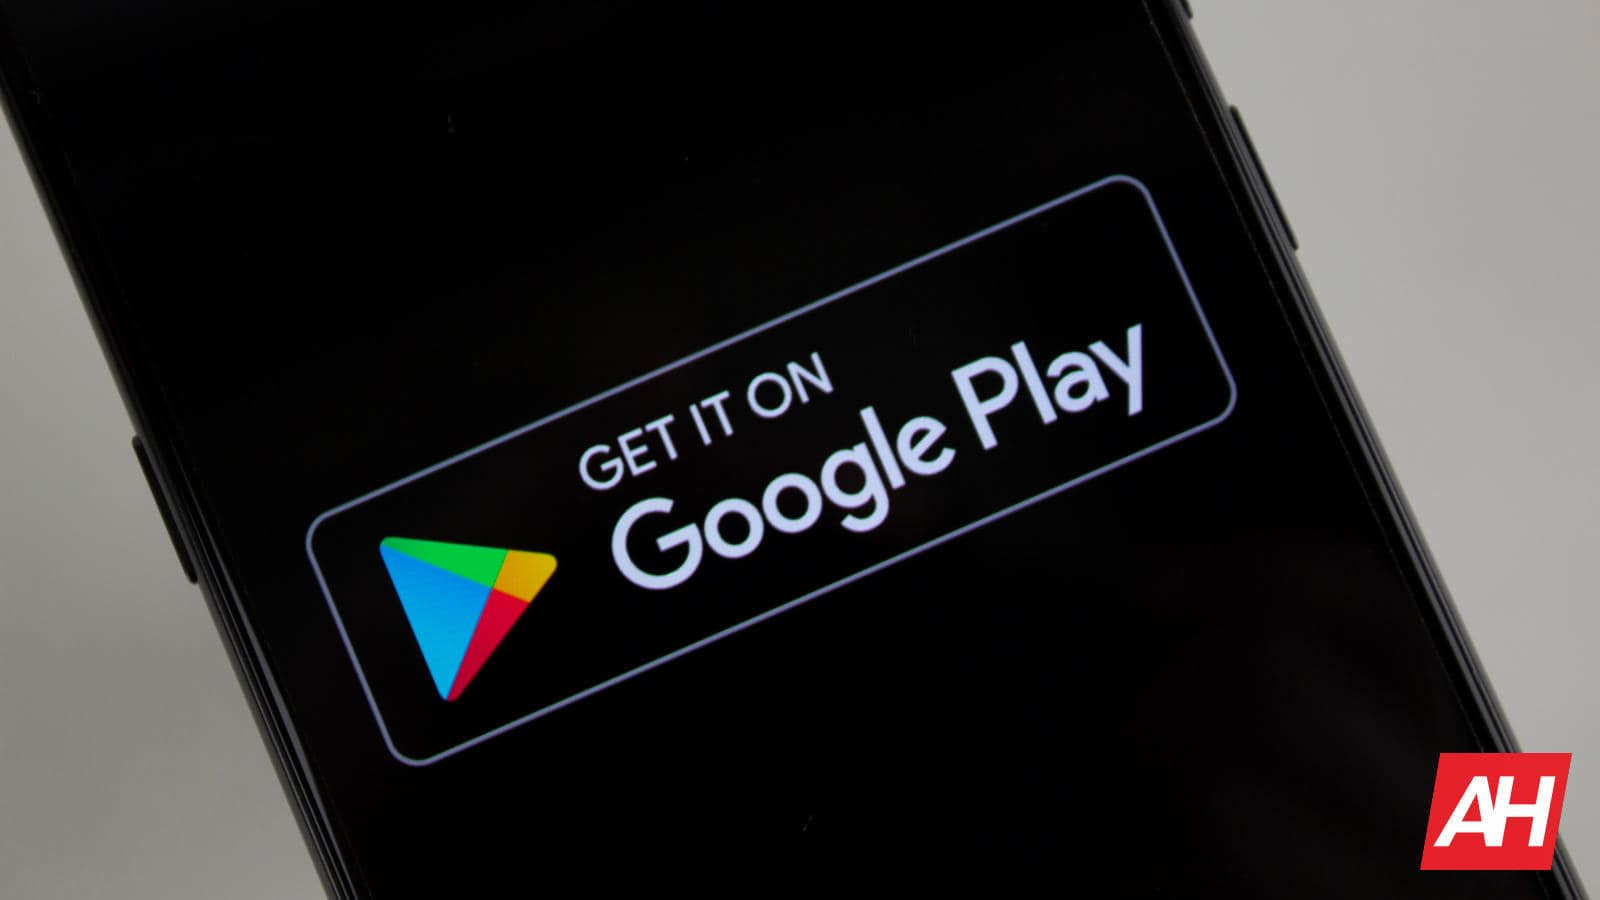 Google Play Store AH NS 06